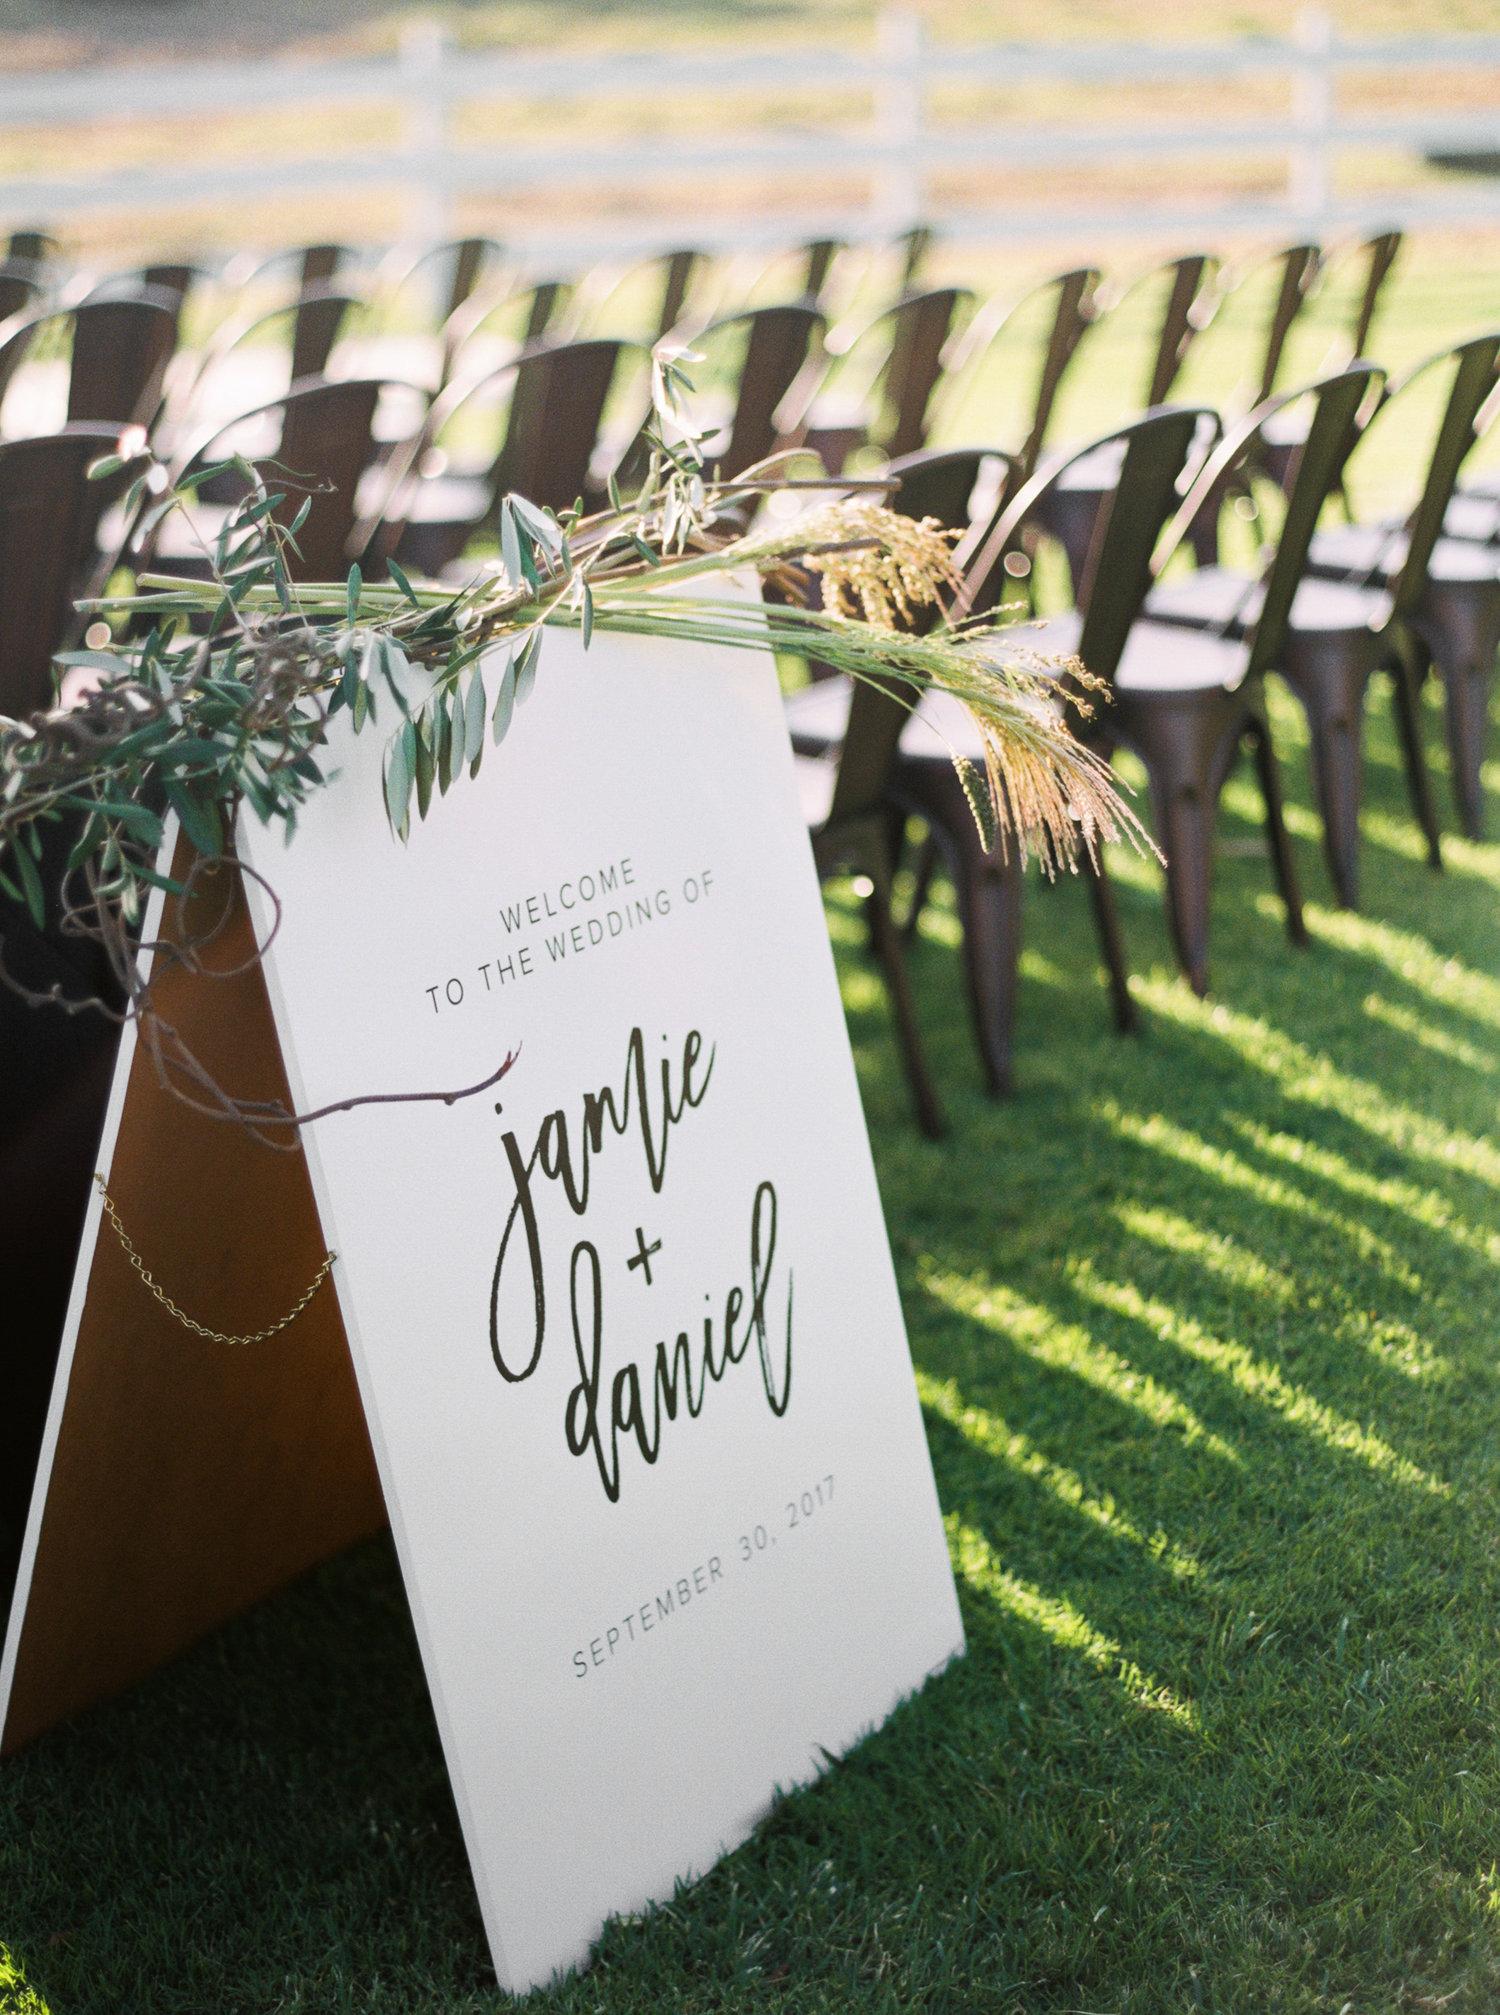 WEDDING-STATIONARY-PHOTOGRAPHER-FILM-CARMEL.jpg